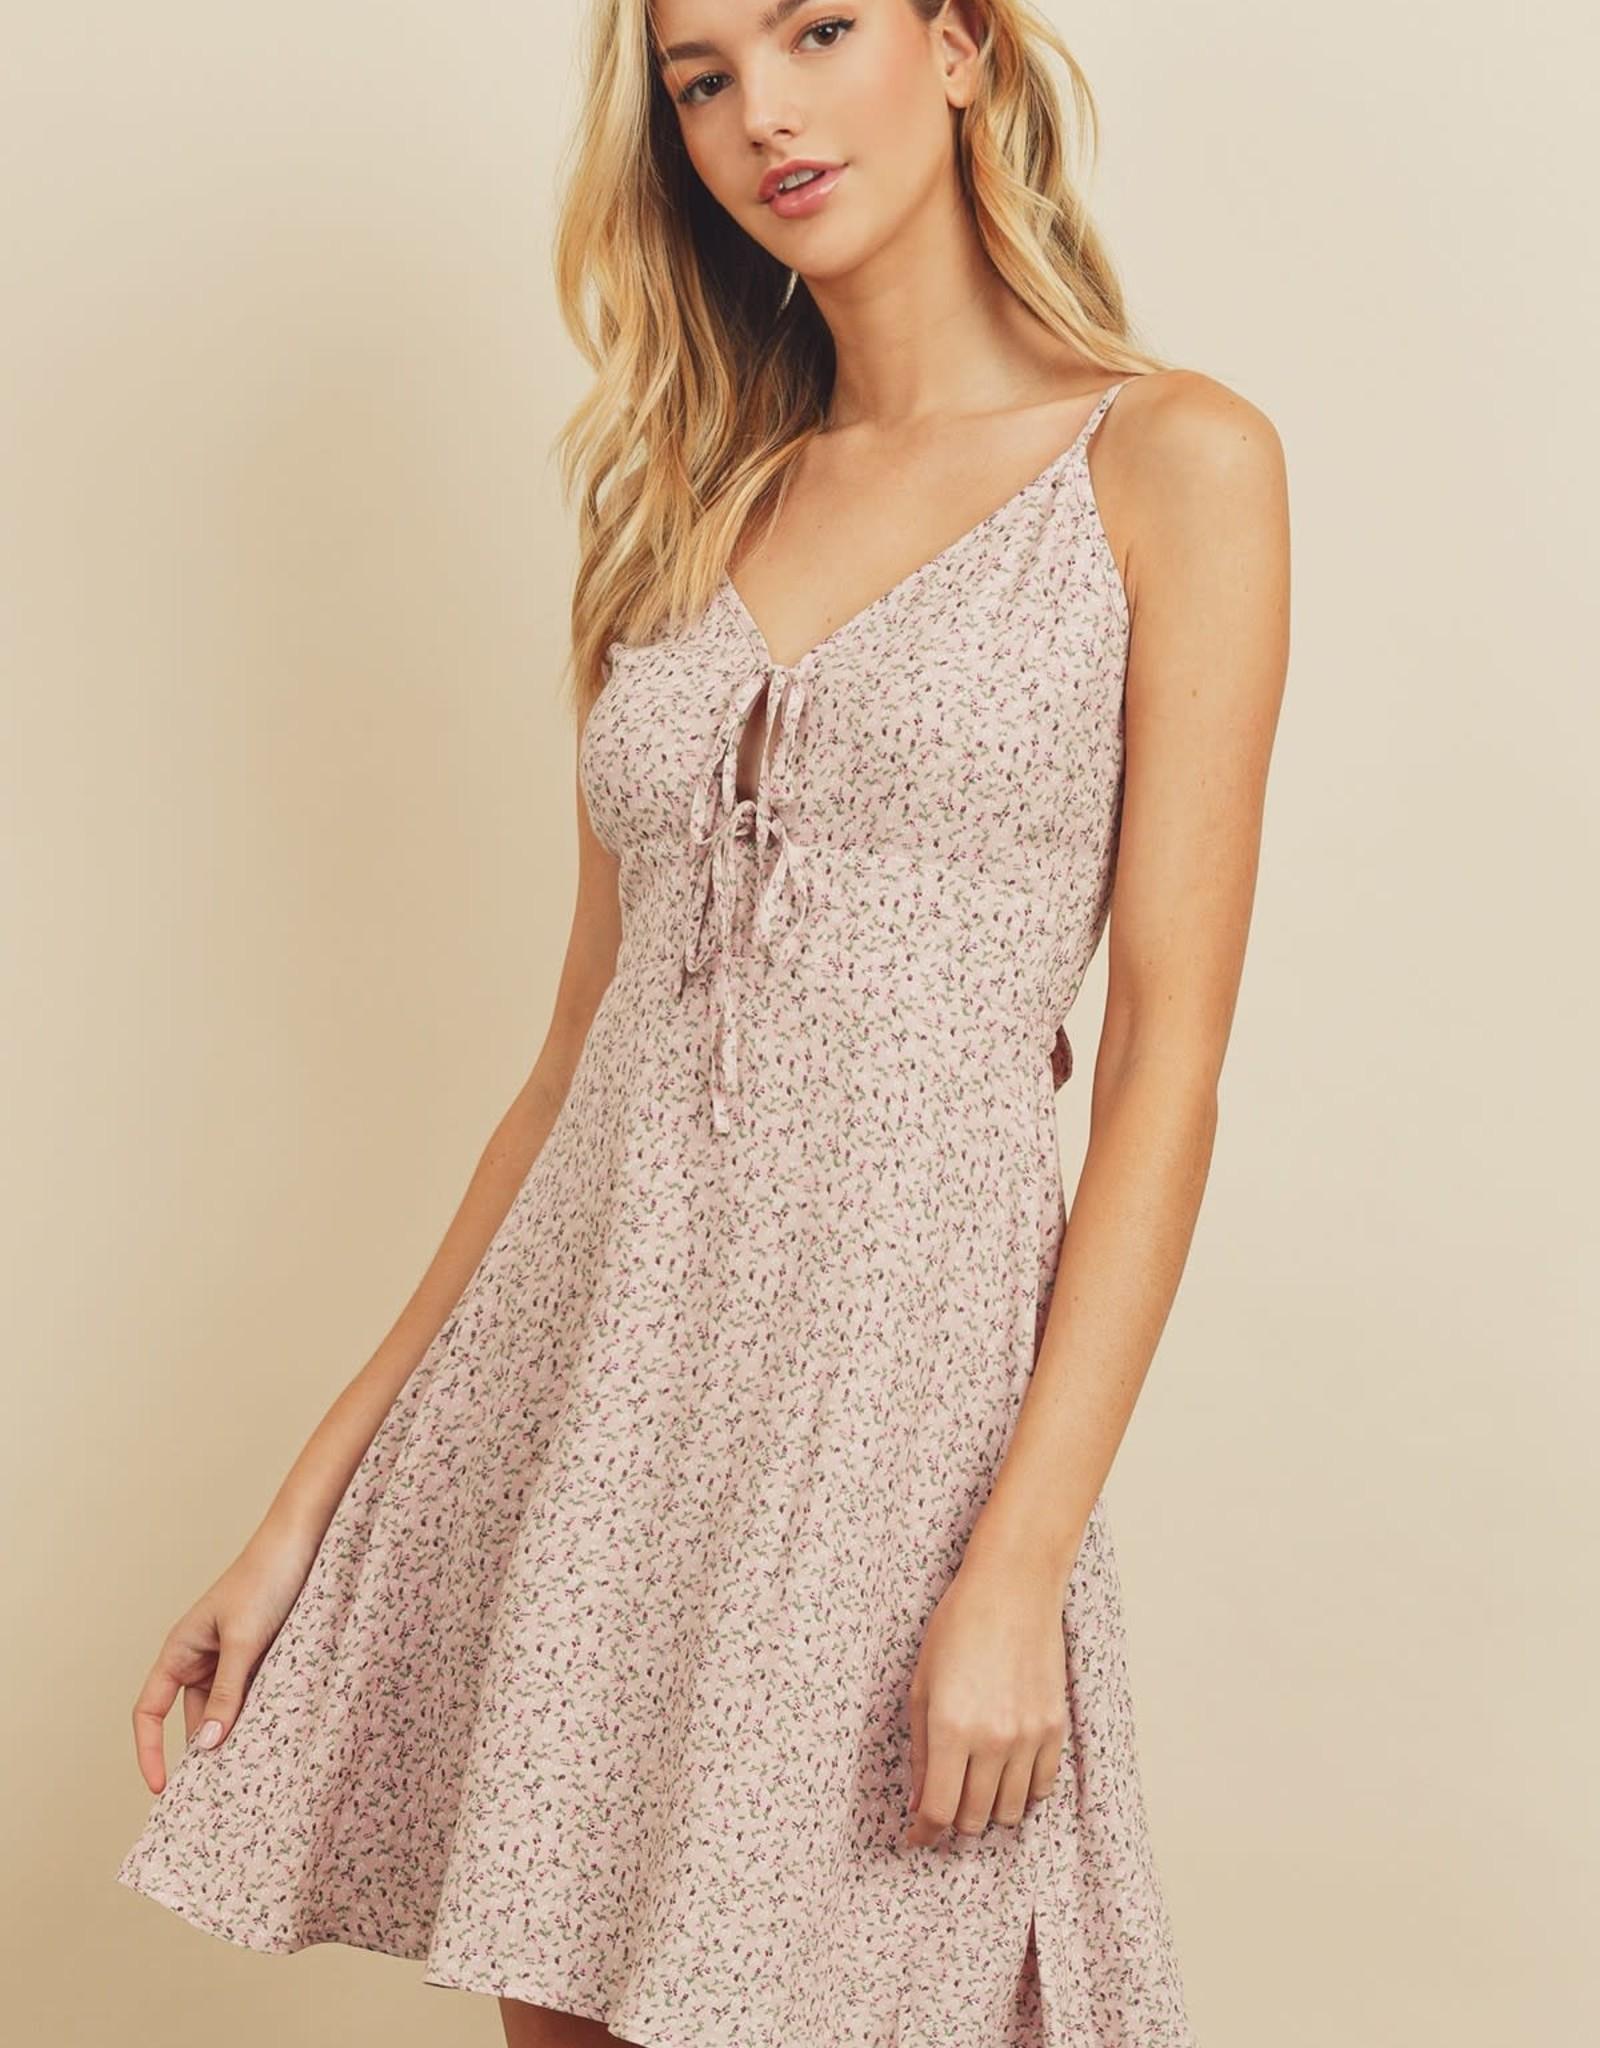 Miss Bliss Ditsy Floral Print Mini Dress- Dusty Pink